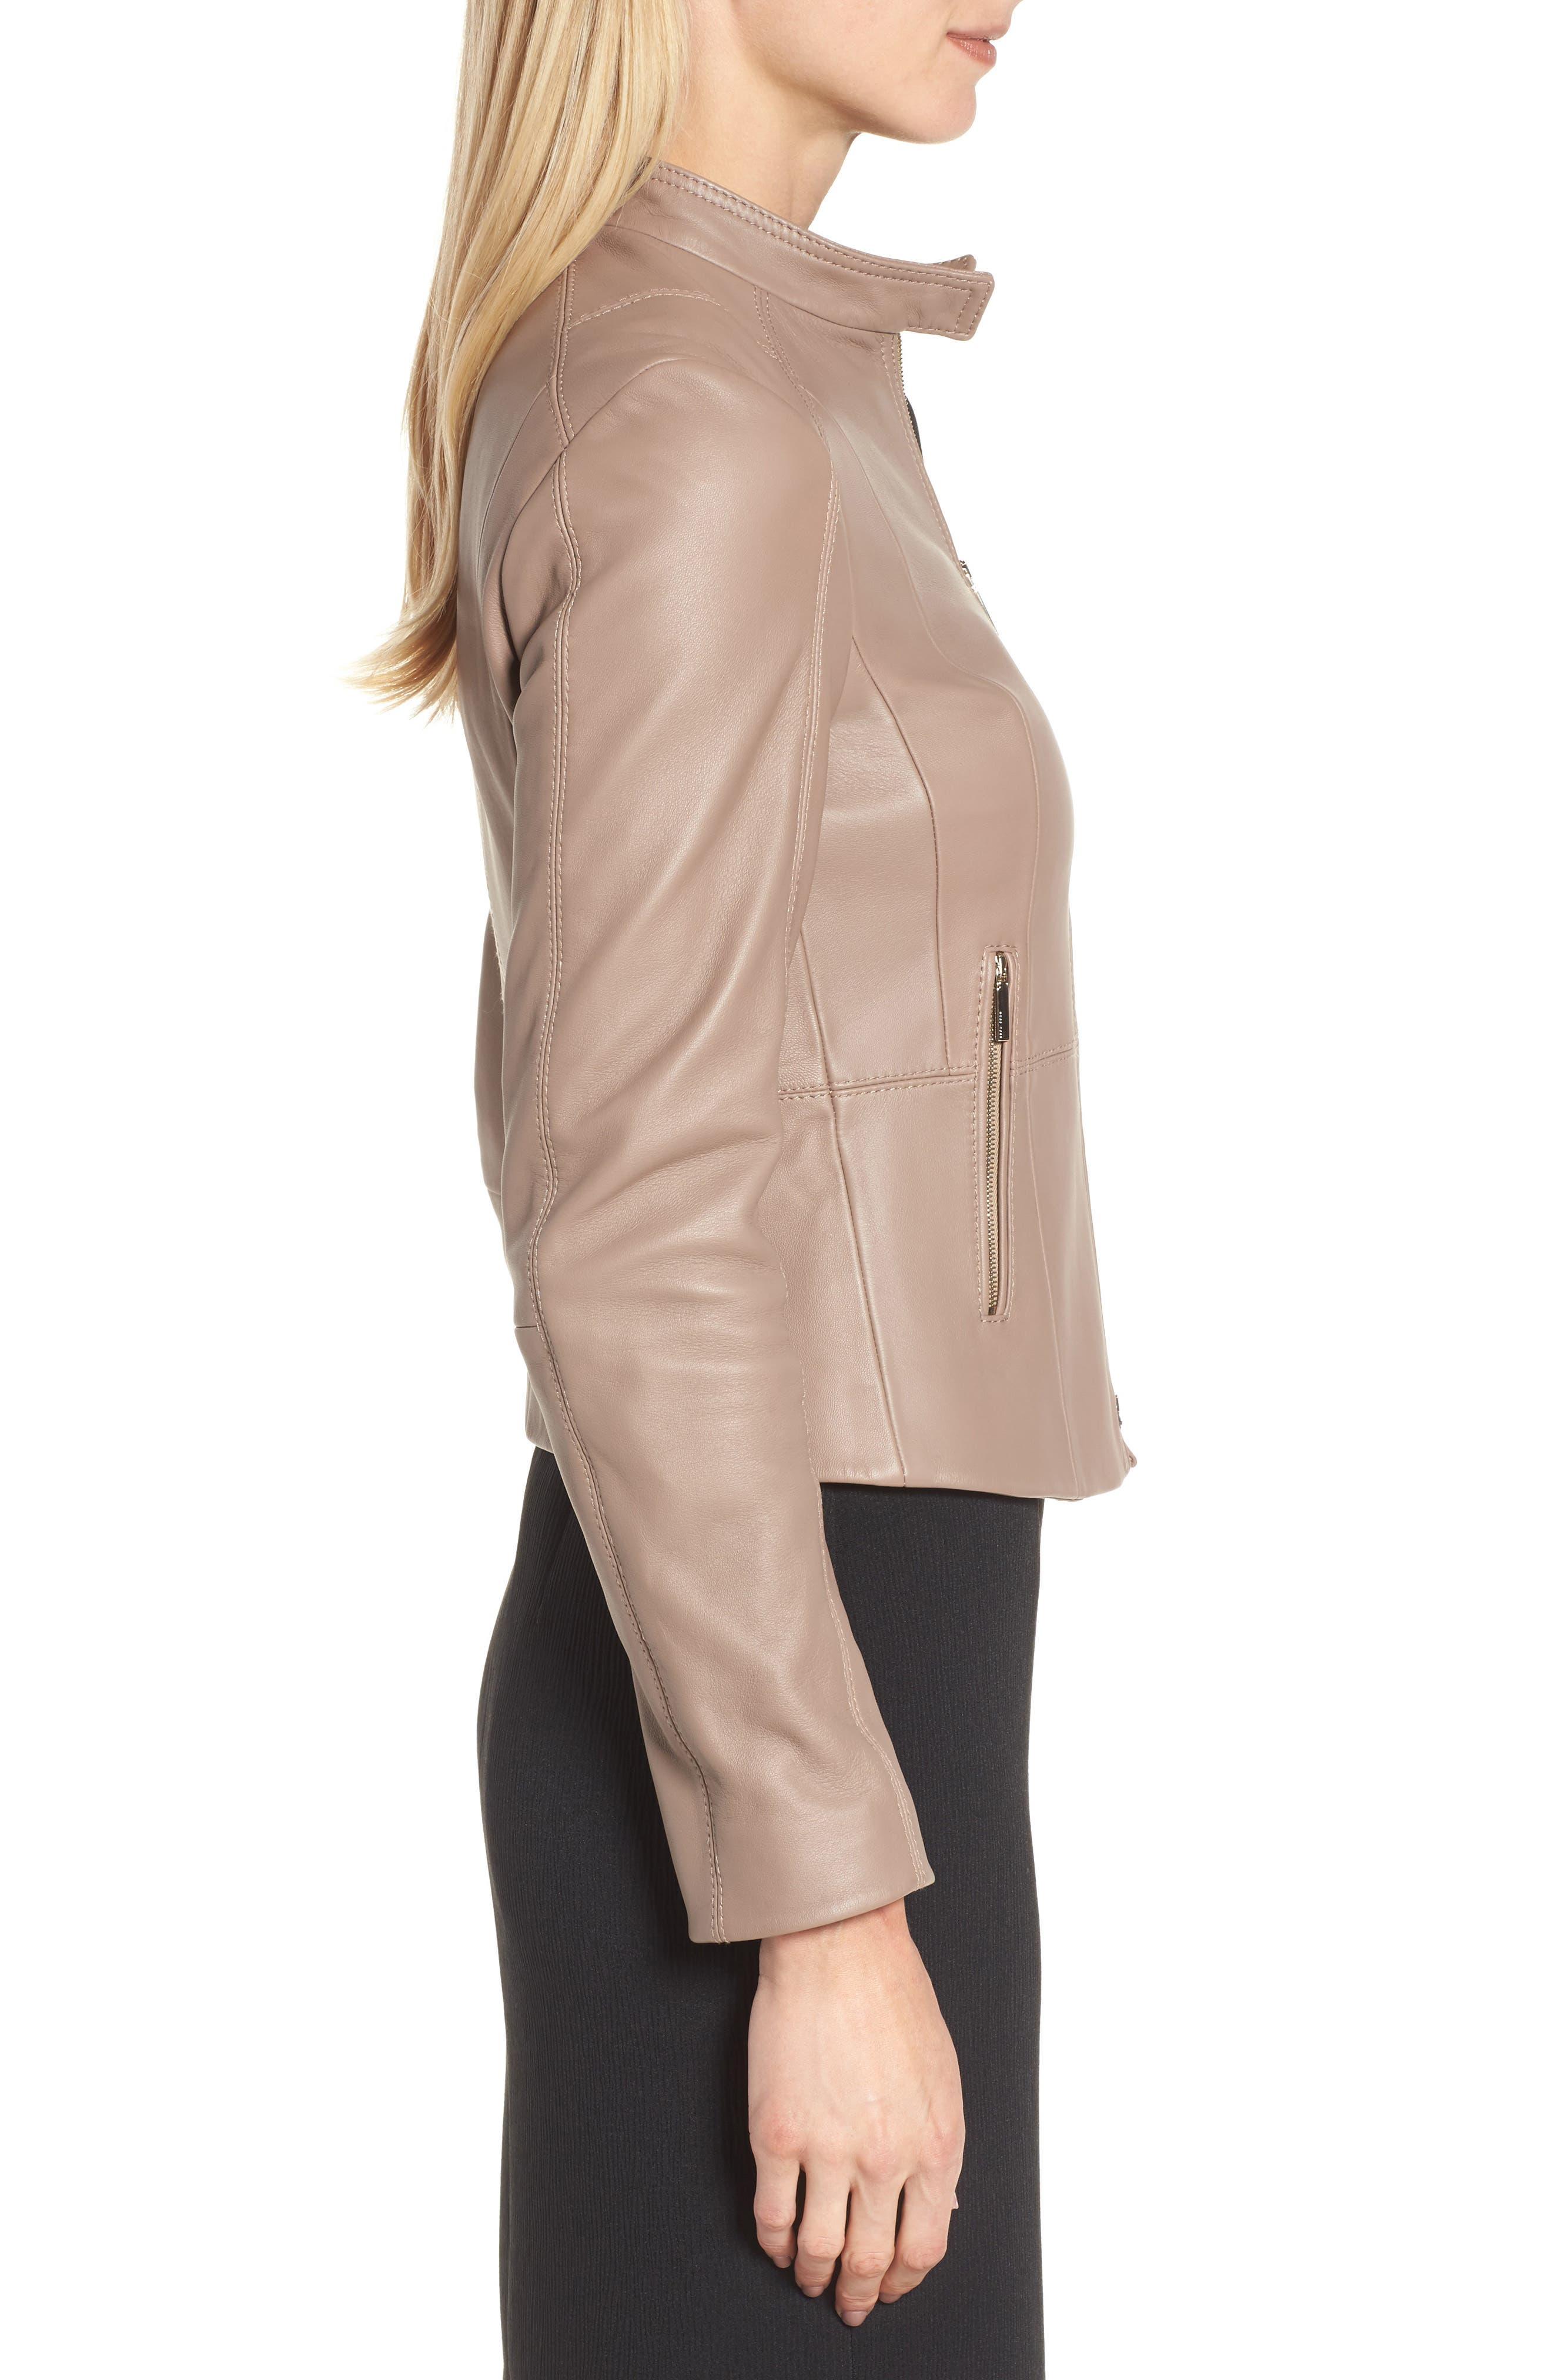 Sammonaie Leather Jacket,                             Alternate thumbnail 6, color,